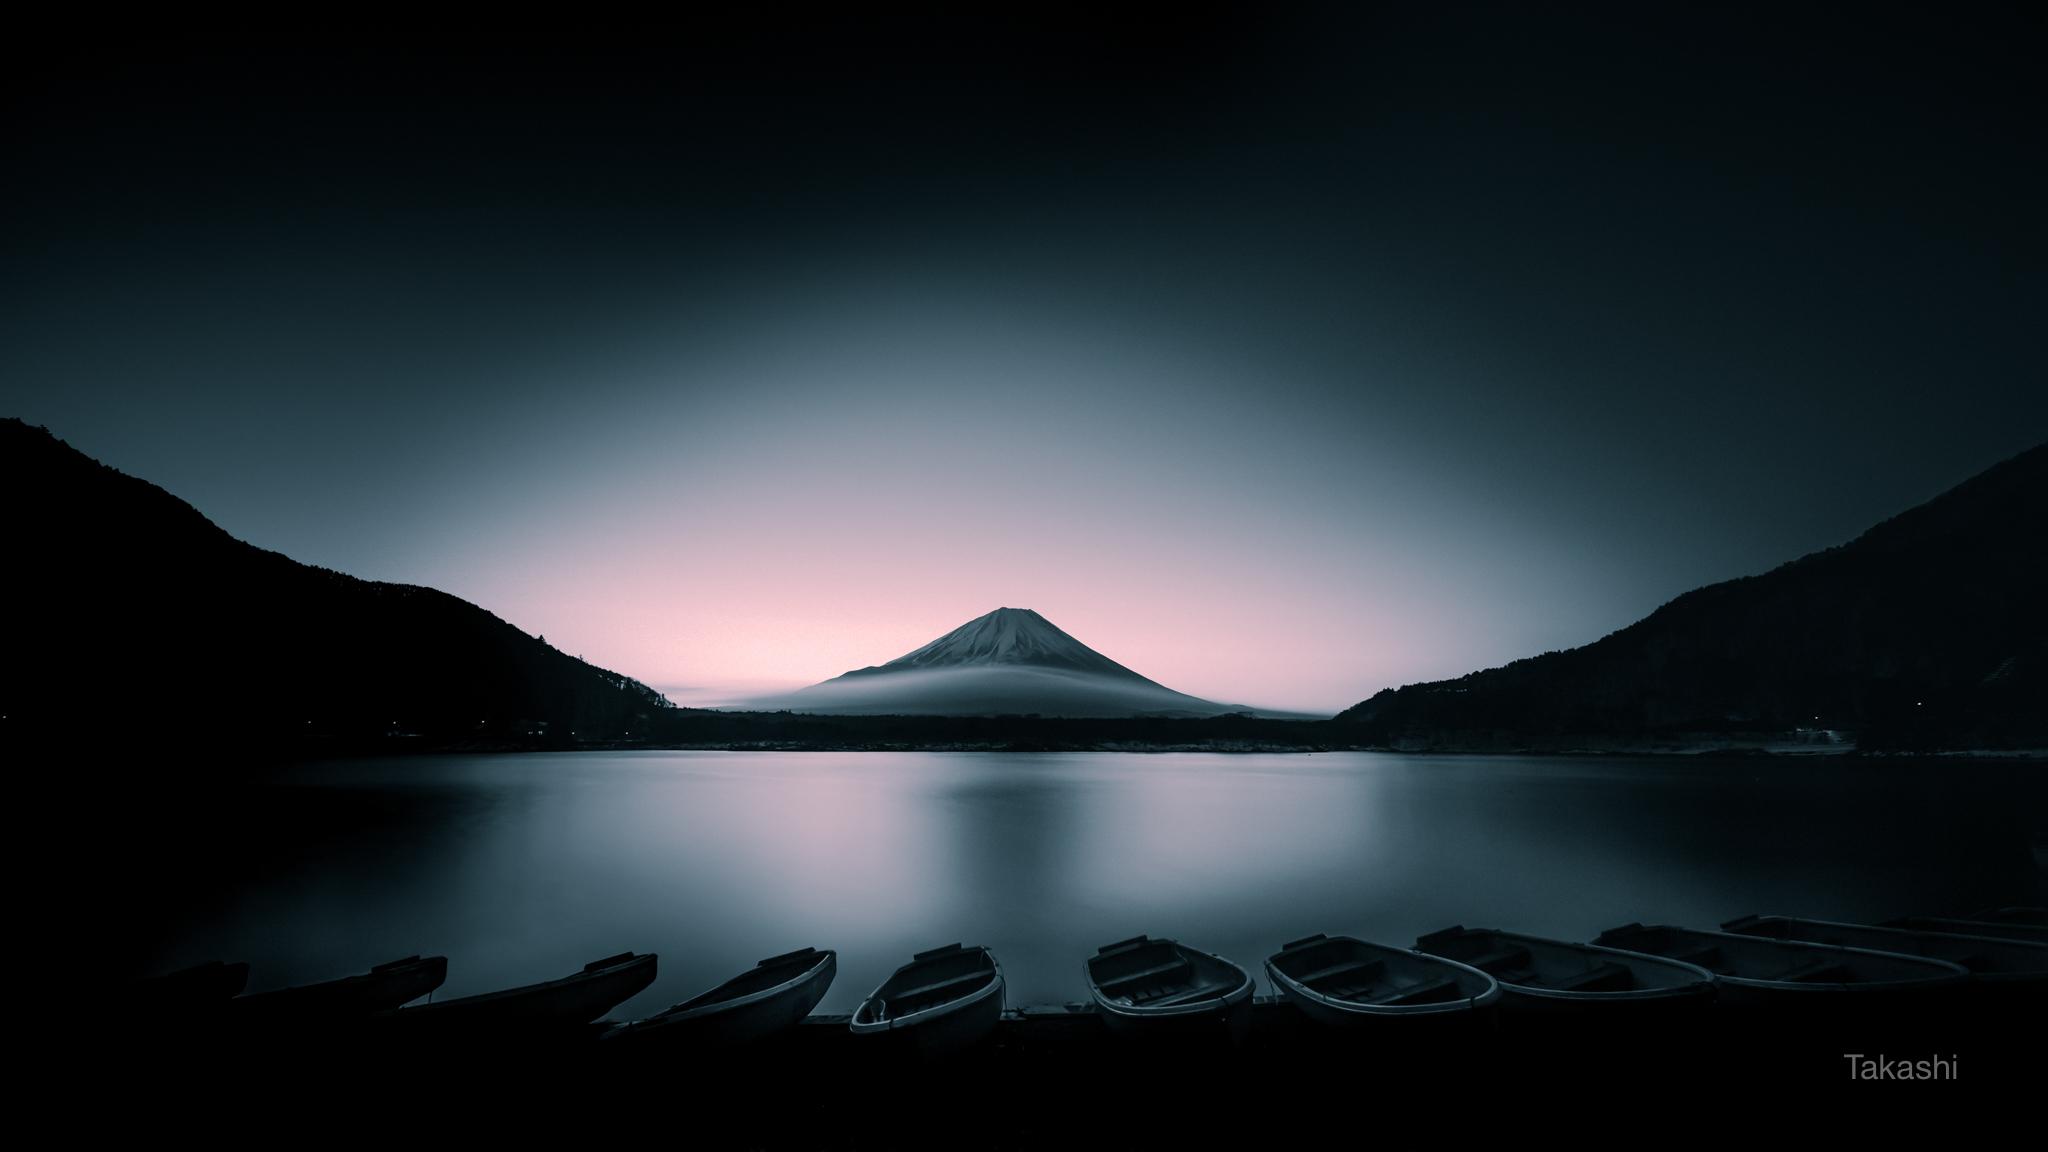 Mount Fuji at dawn